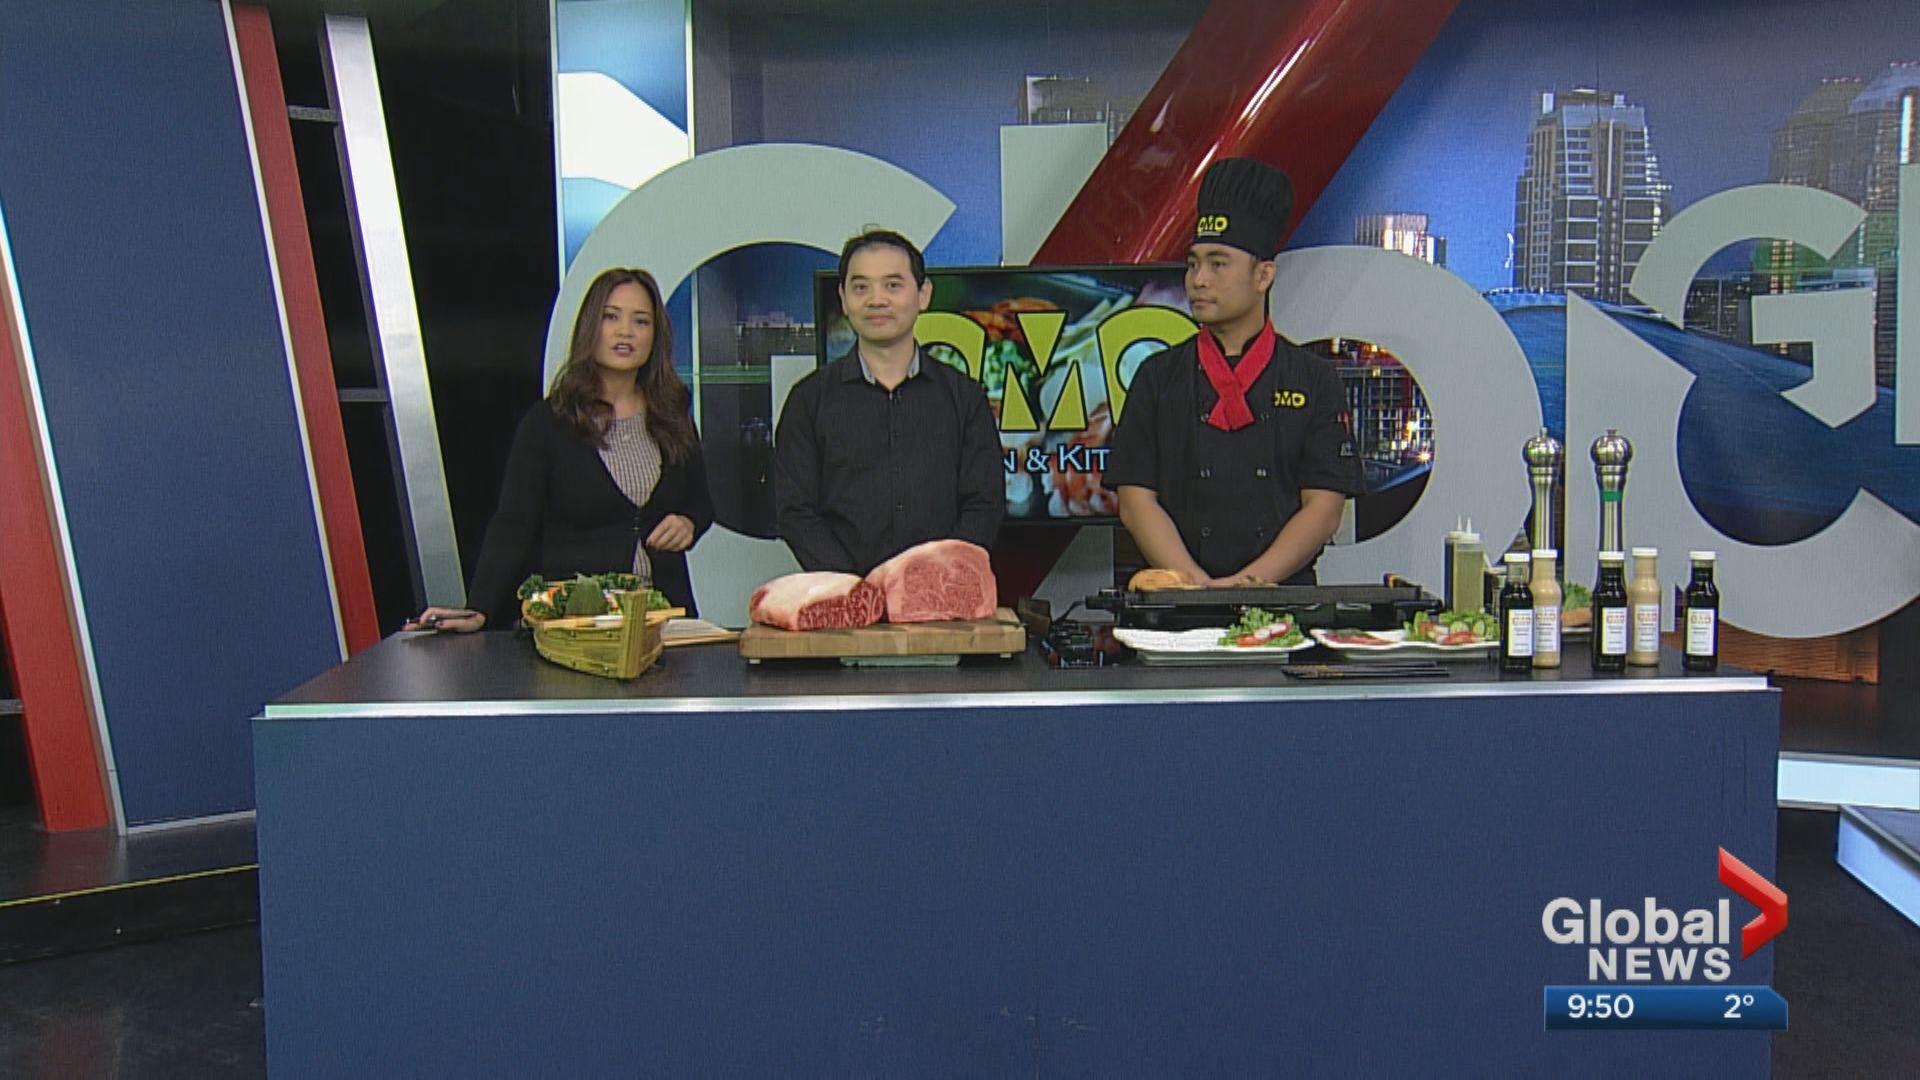 Calgary Japanese restaurant takes traditional teppanyaki twist on restaurant menu staple